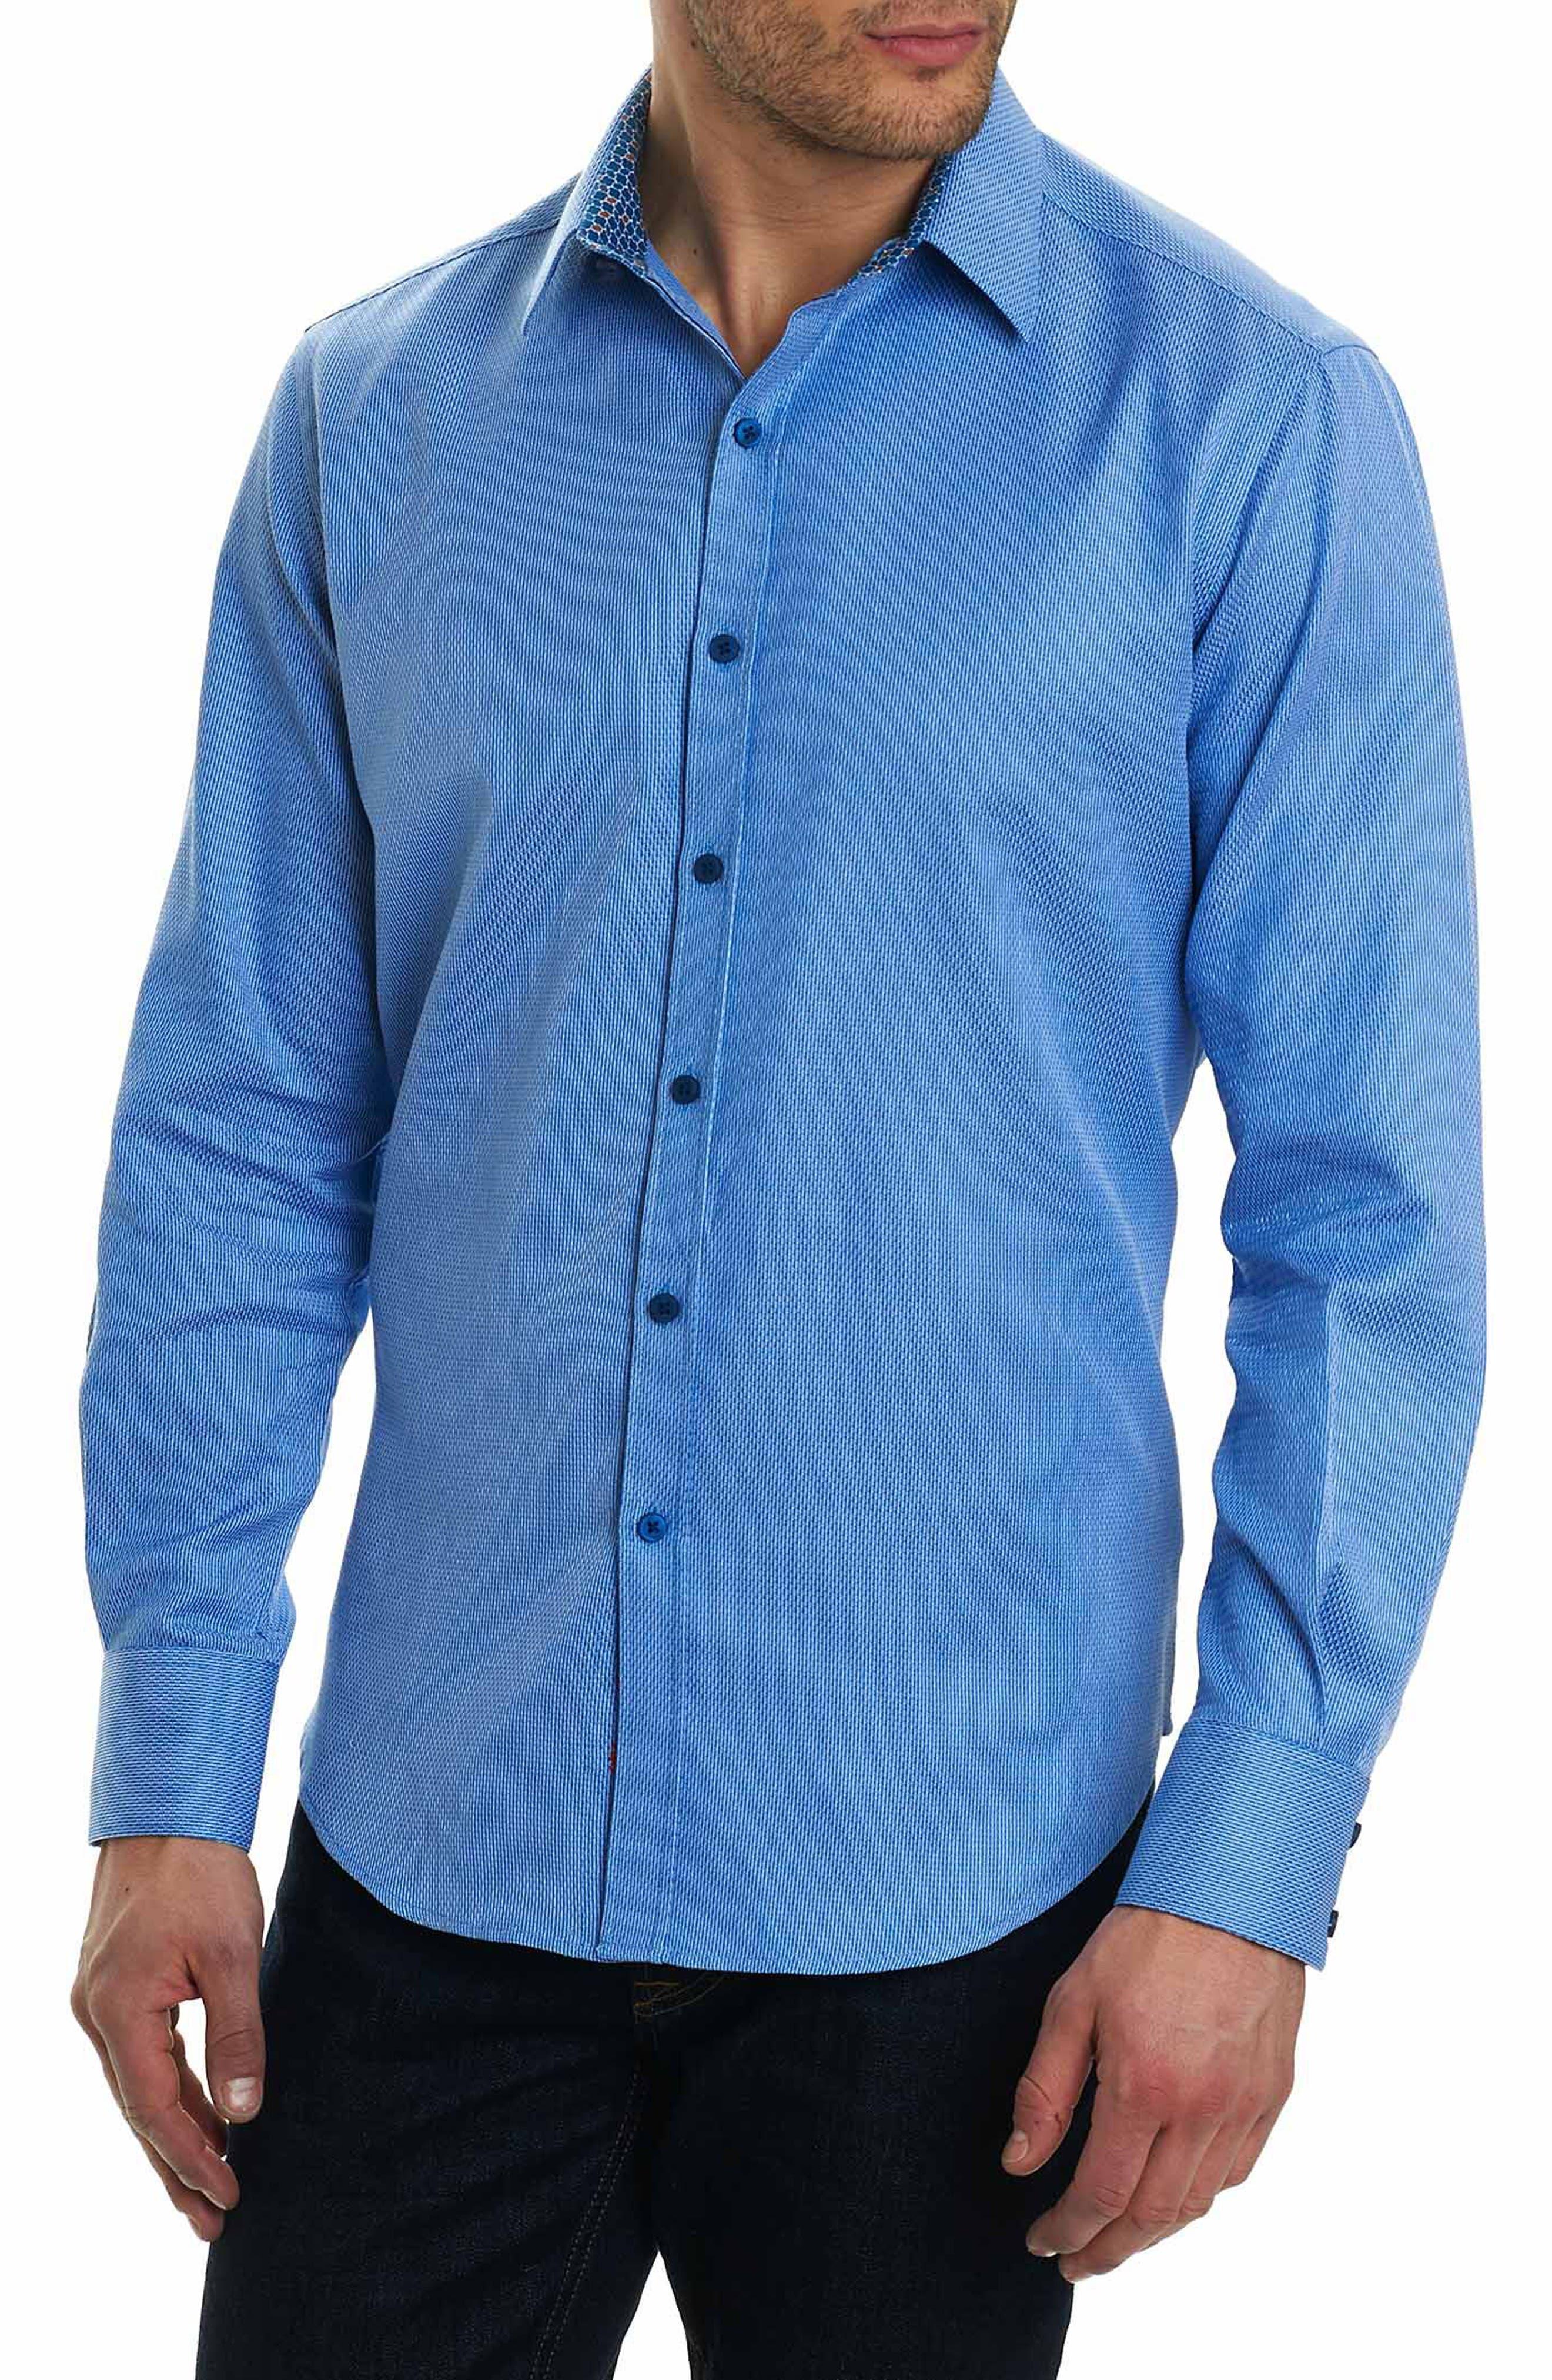 Jobson Classic Fit Sport Shirt,                         Main,                         color, Blue